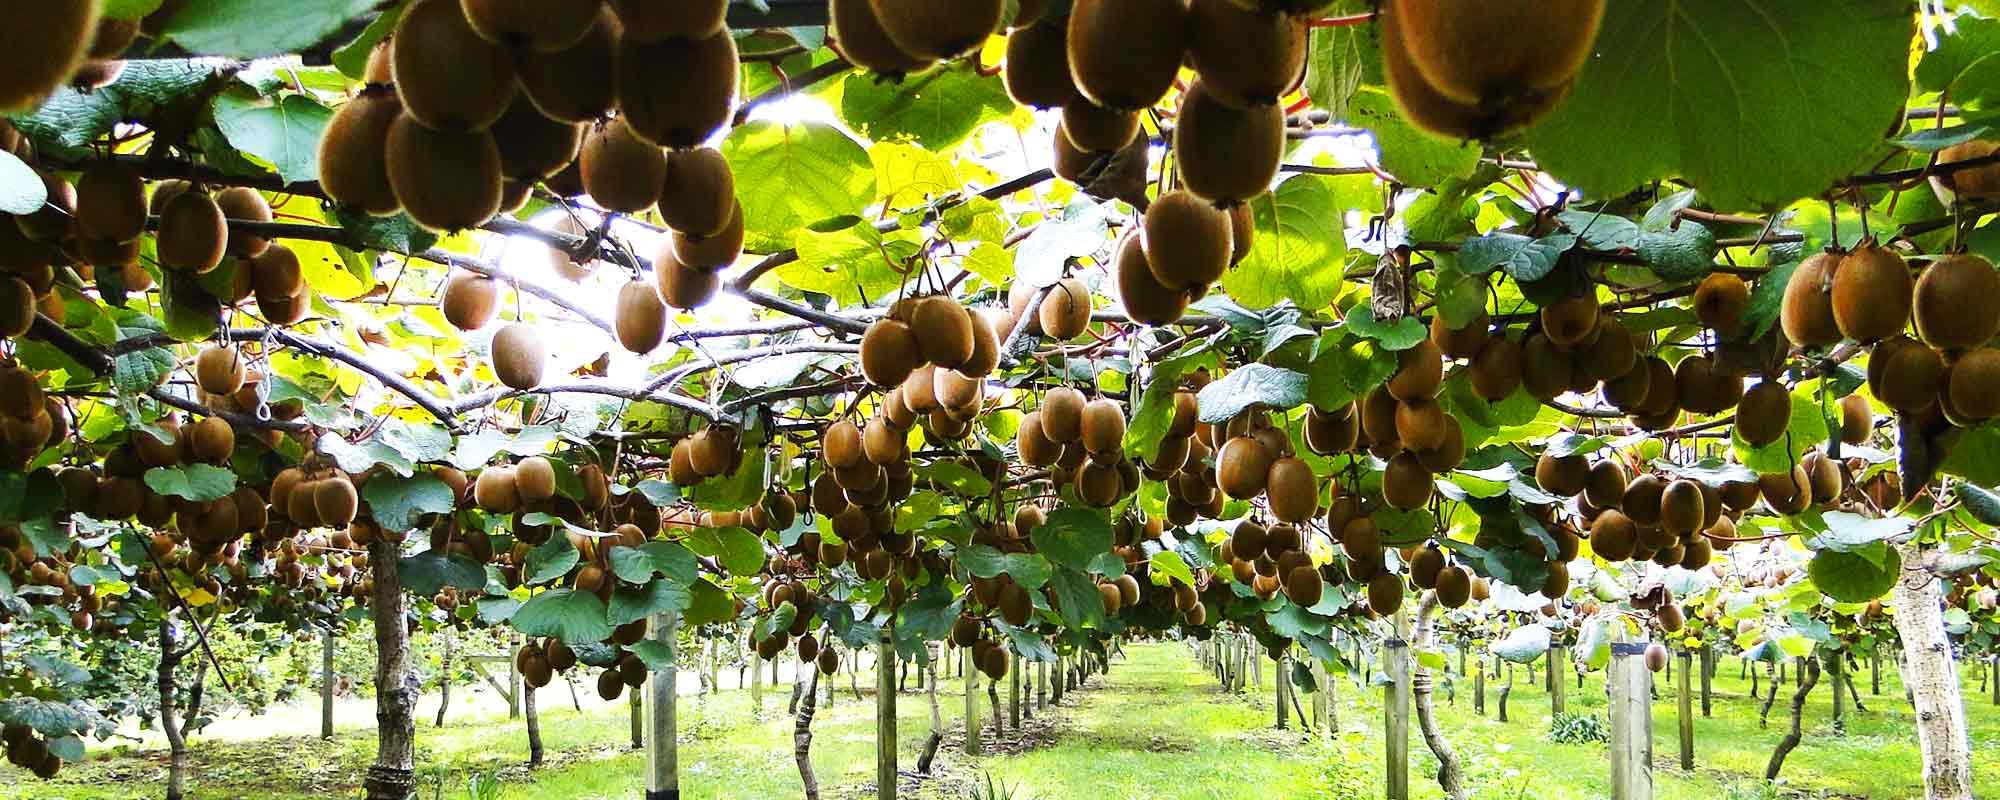 Kiwis Plantage